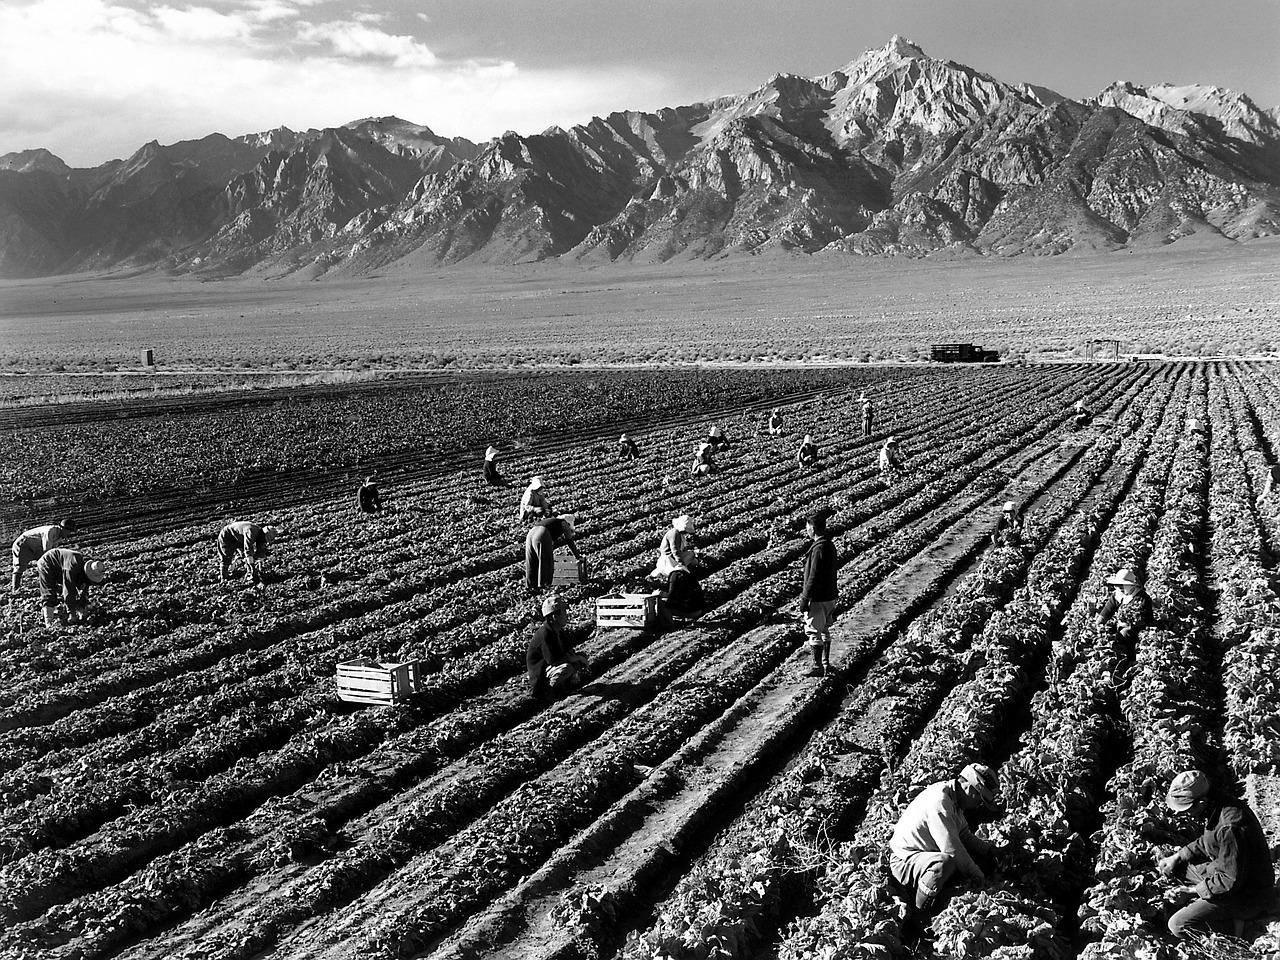 Ansel Adams Harvest Fieldwork Mount Williamson